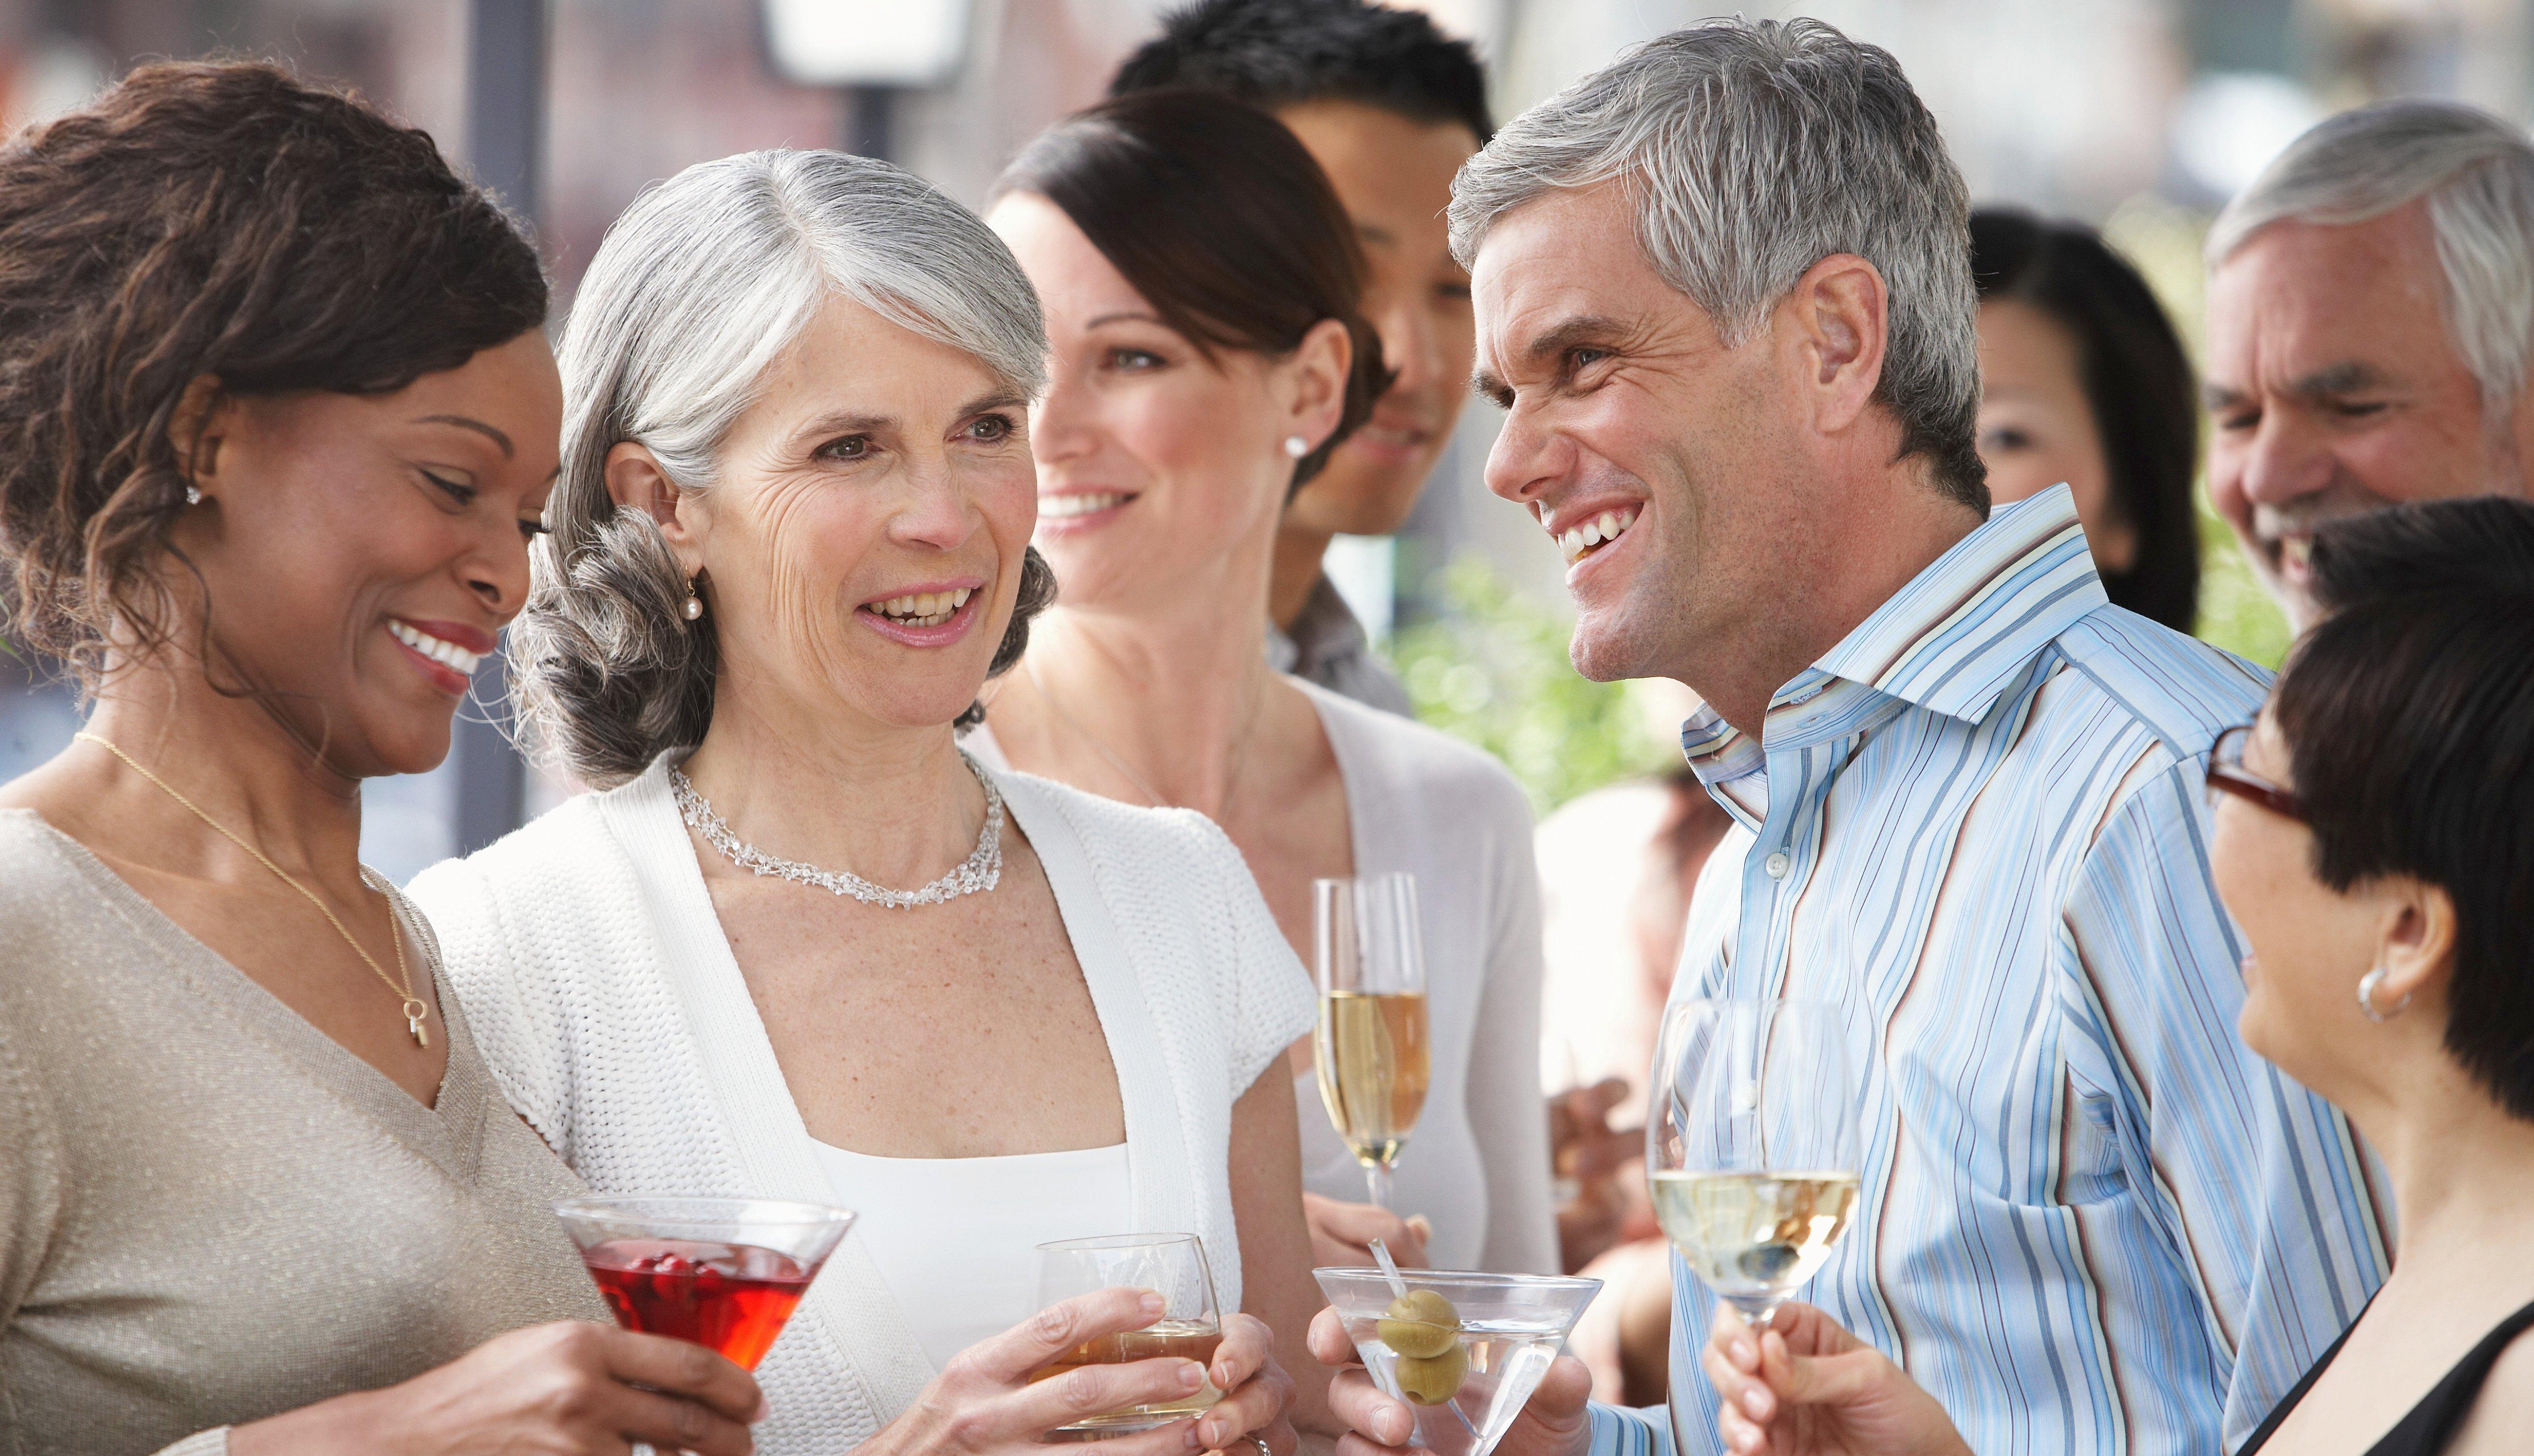 Grupo de adultos socializando mientras toman alcohol